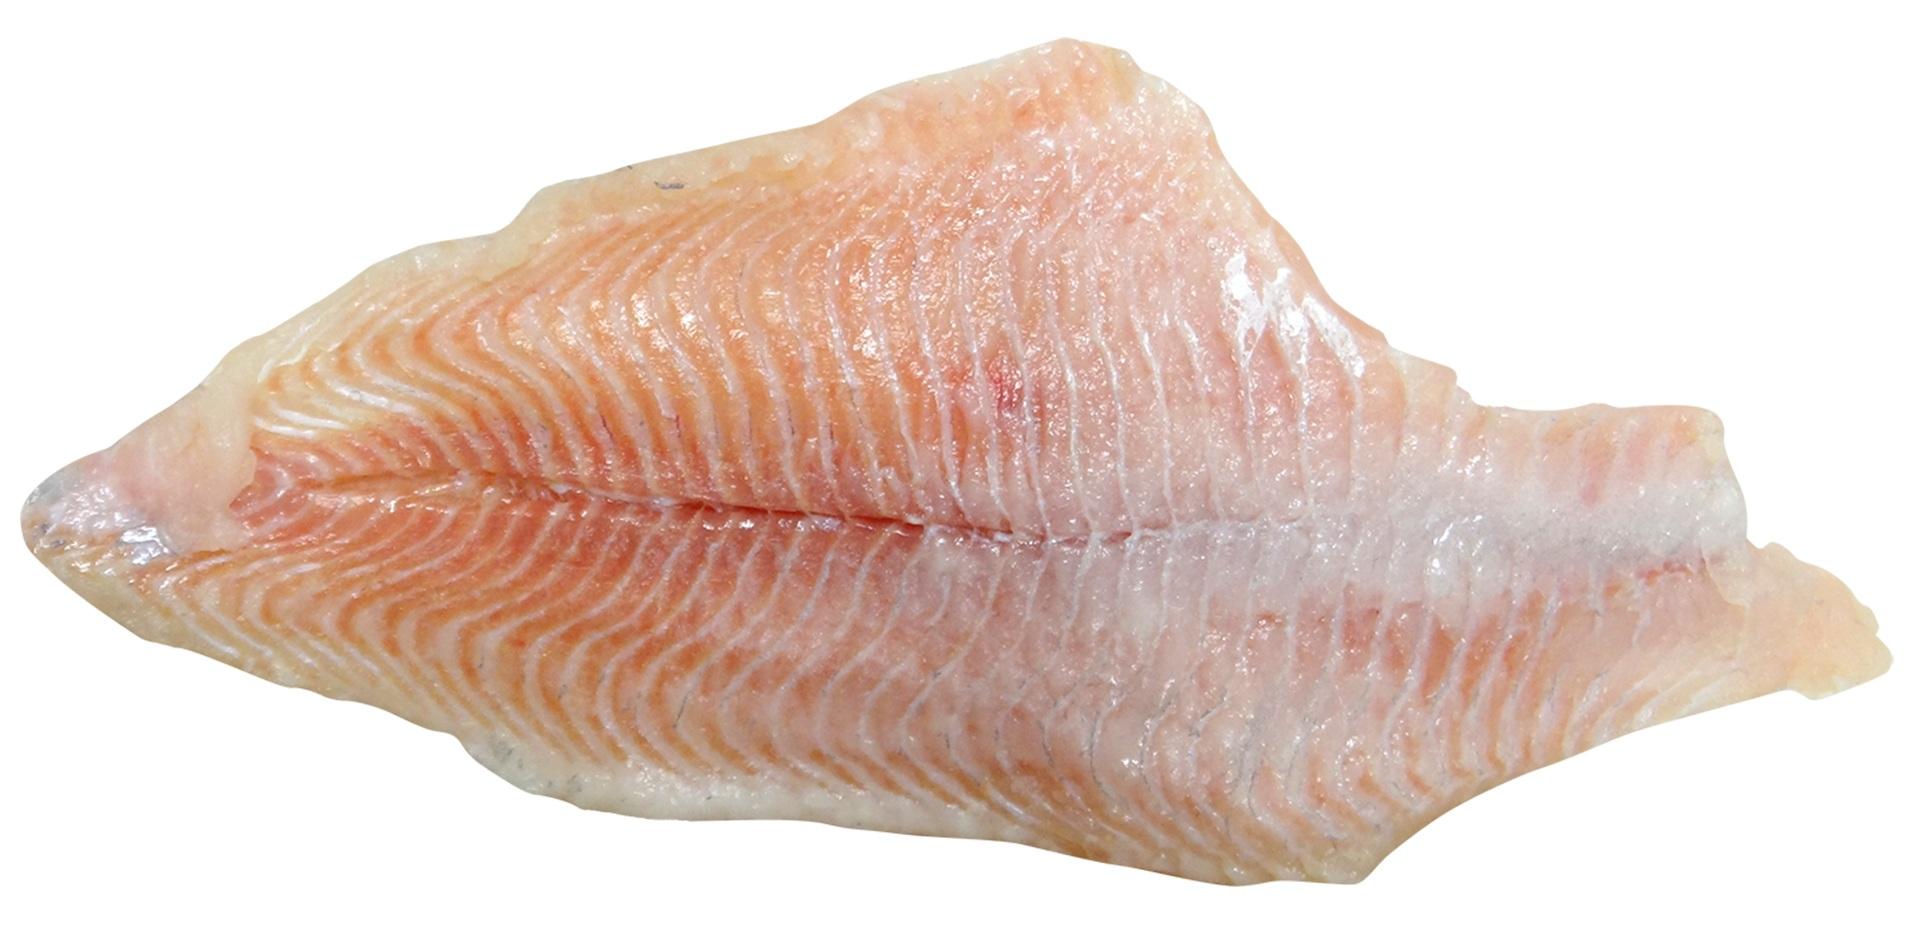 A catfish filet